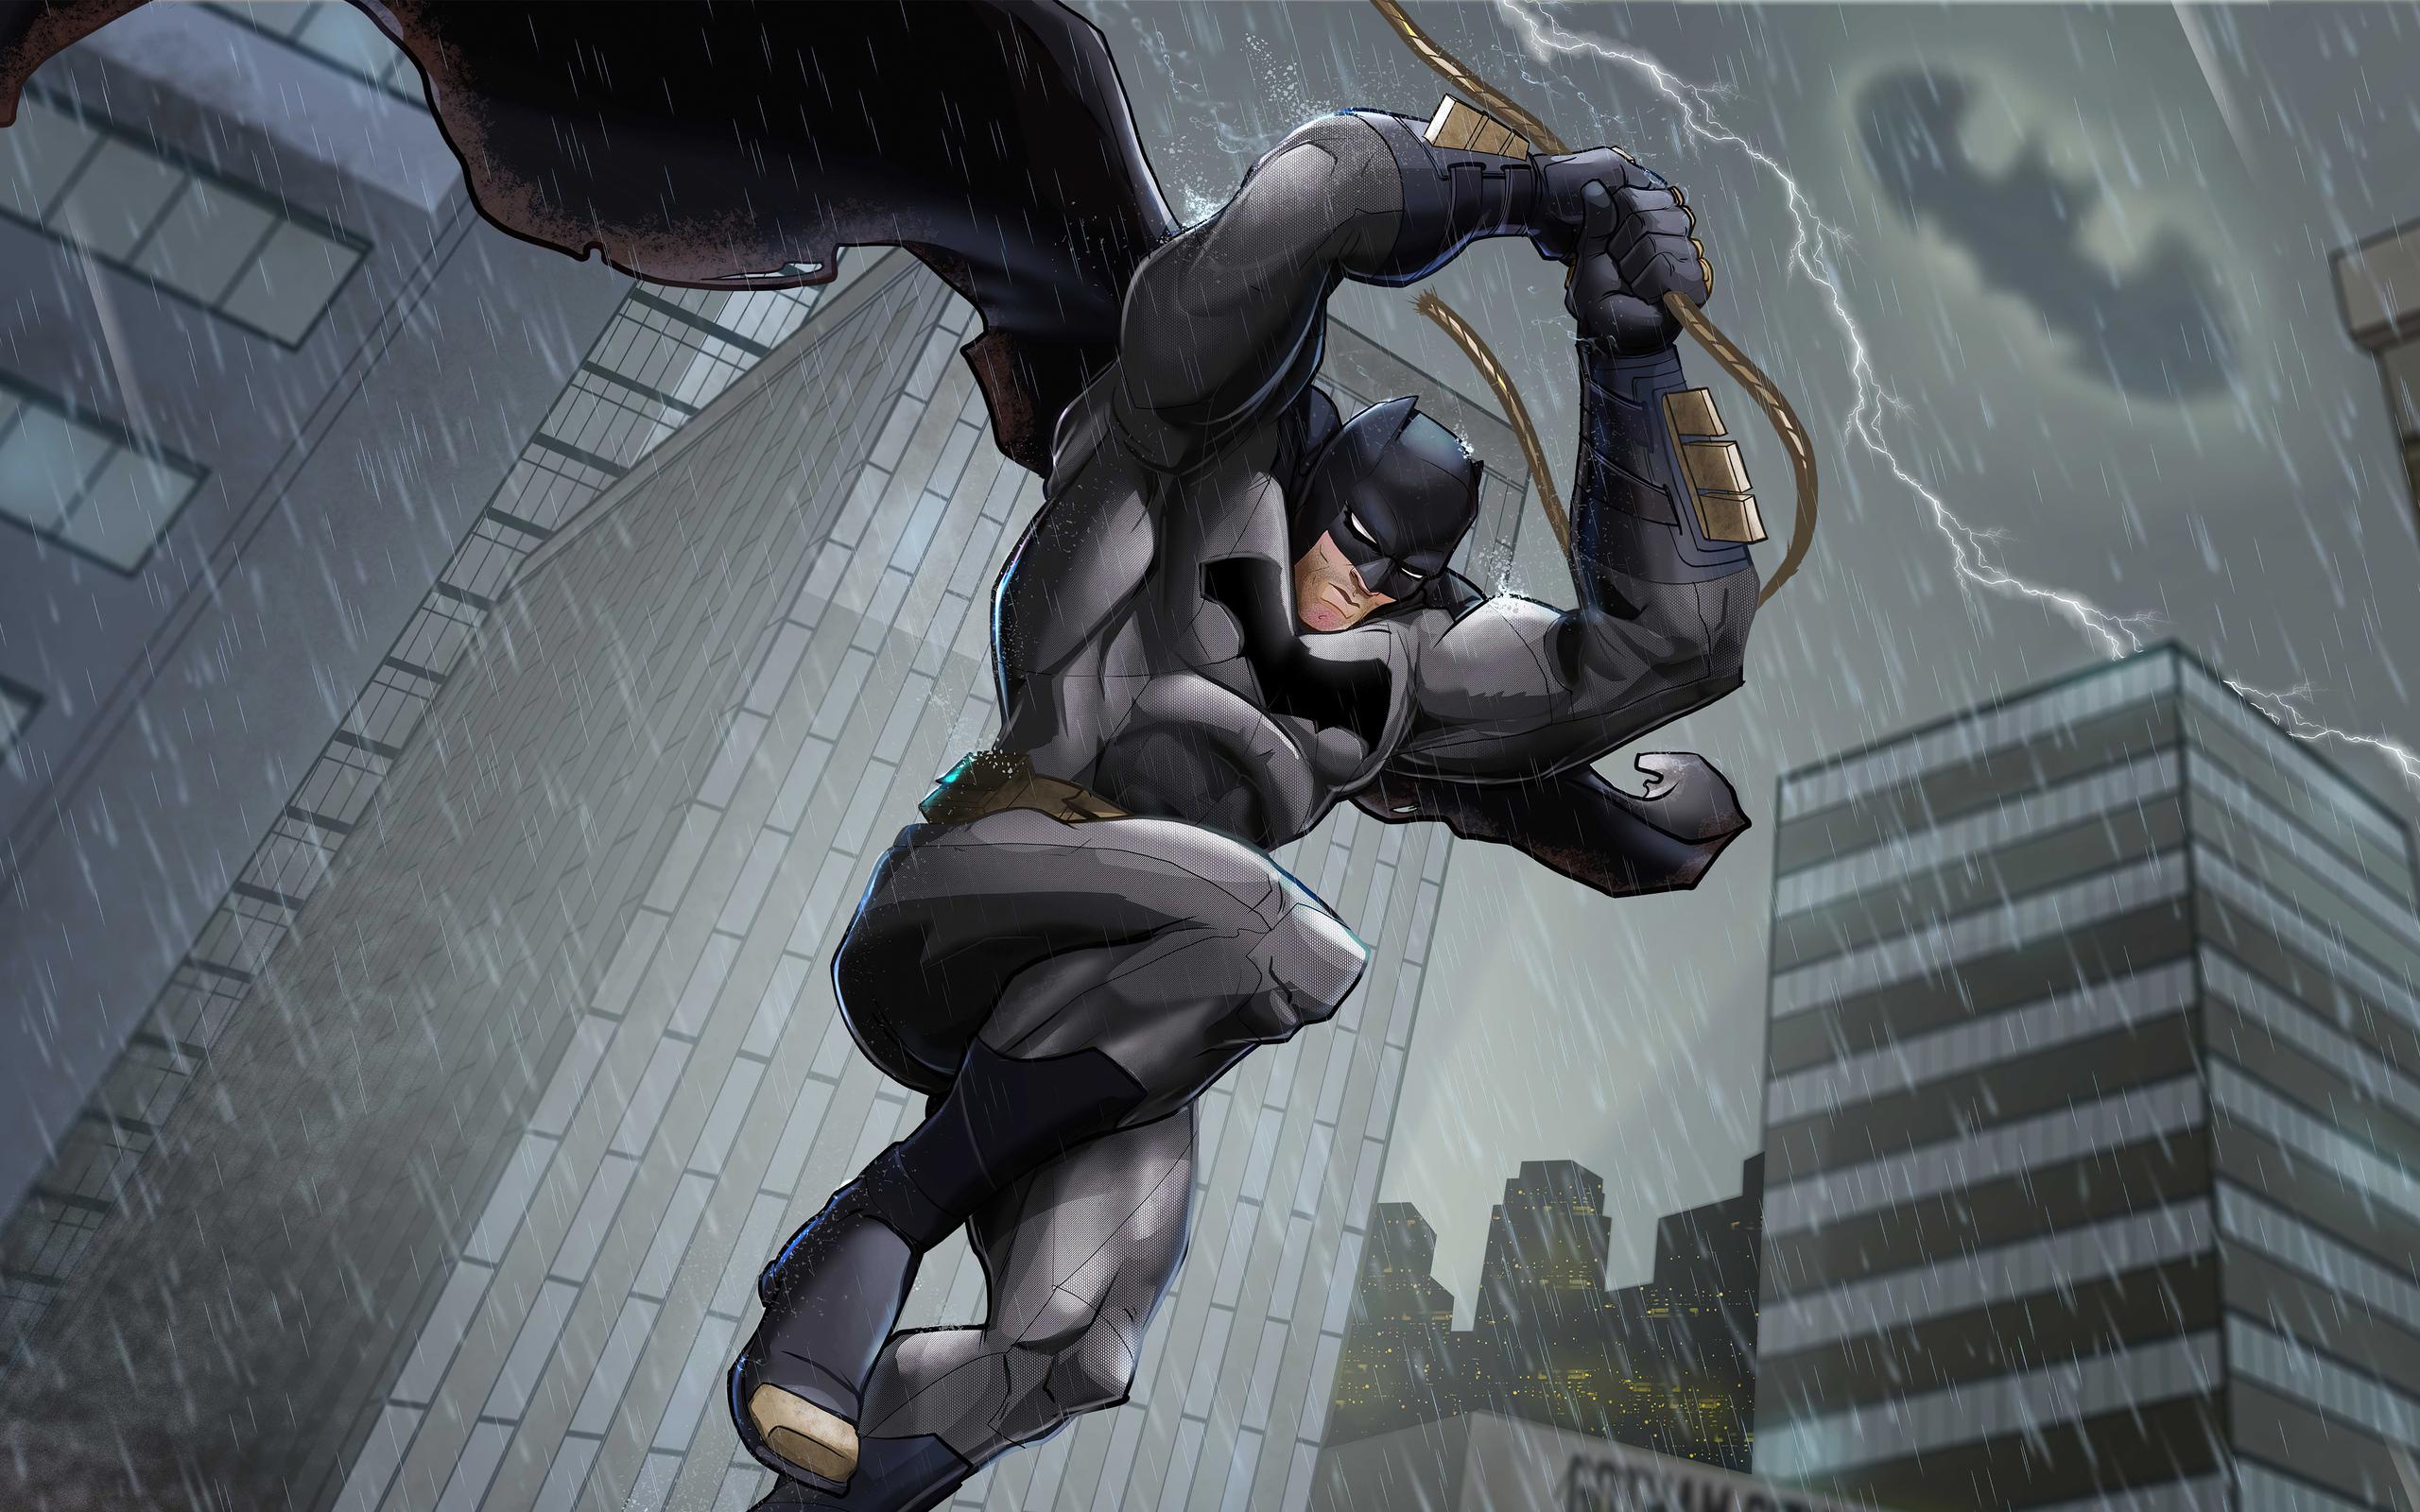 batman-knight-rainy-day-5k-x5.jpg